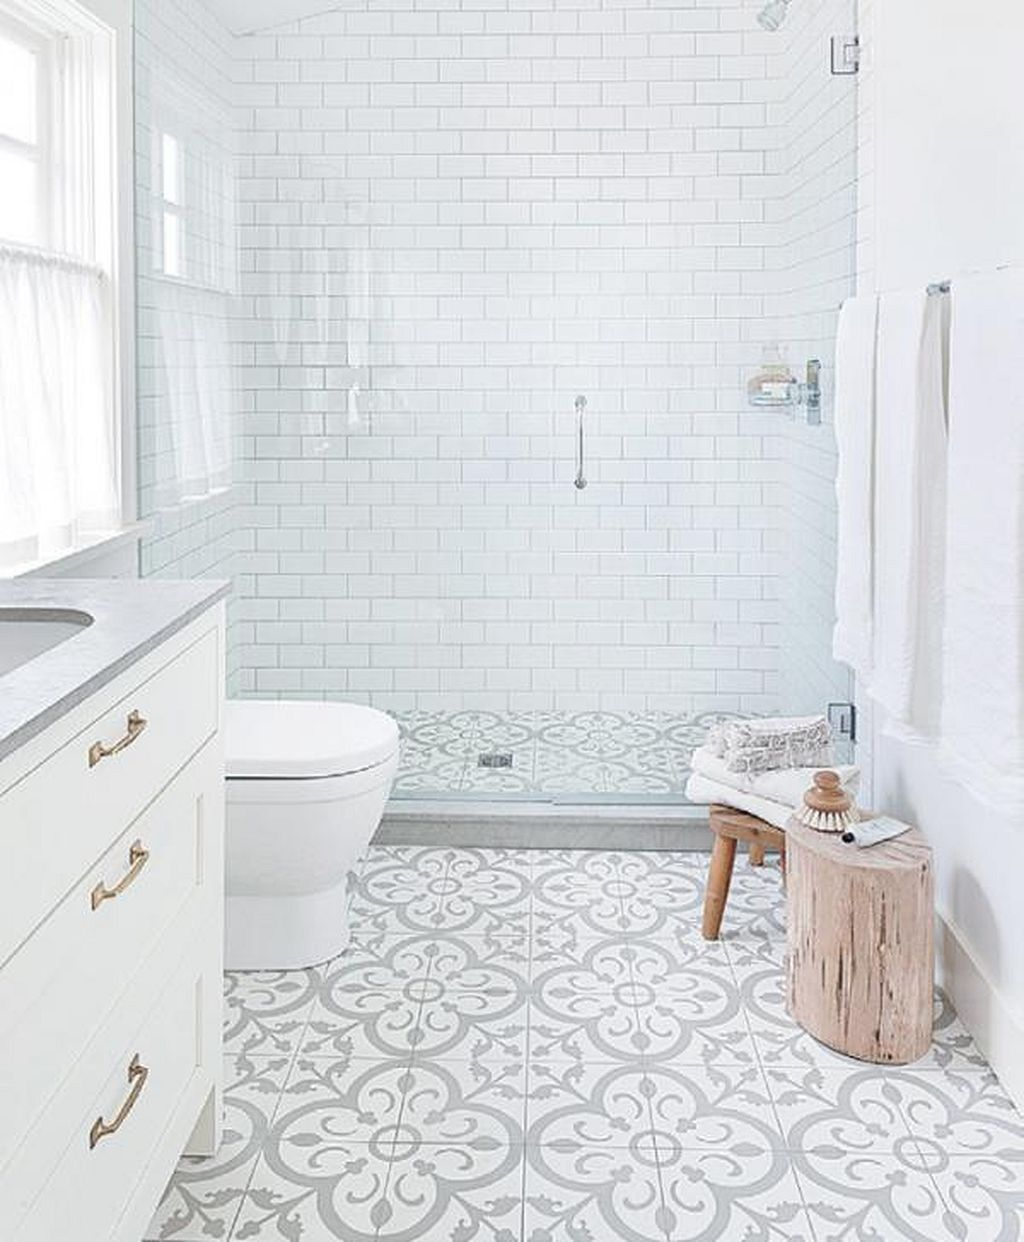 Latest Trends In Bathroom Tile Design (61) | Tile design, Bathroom ...